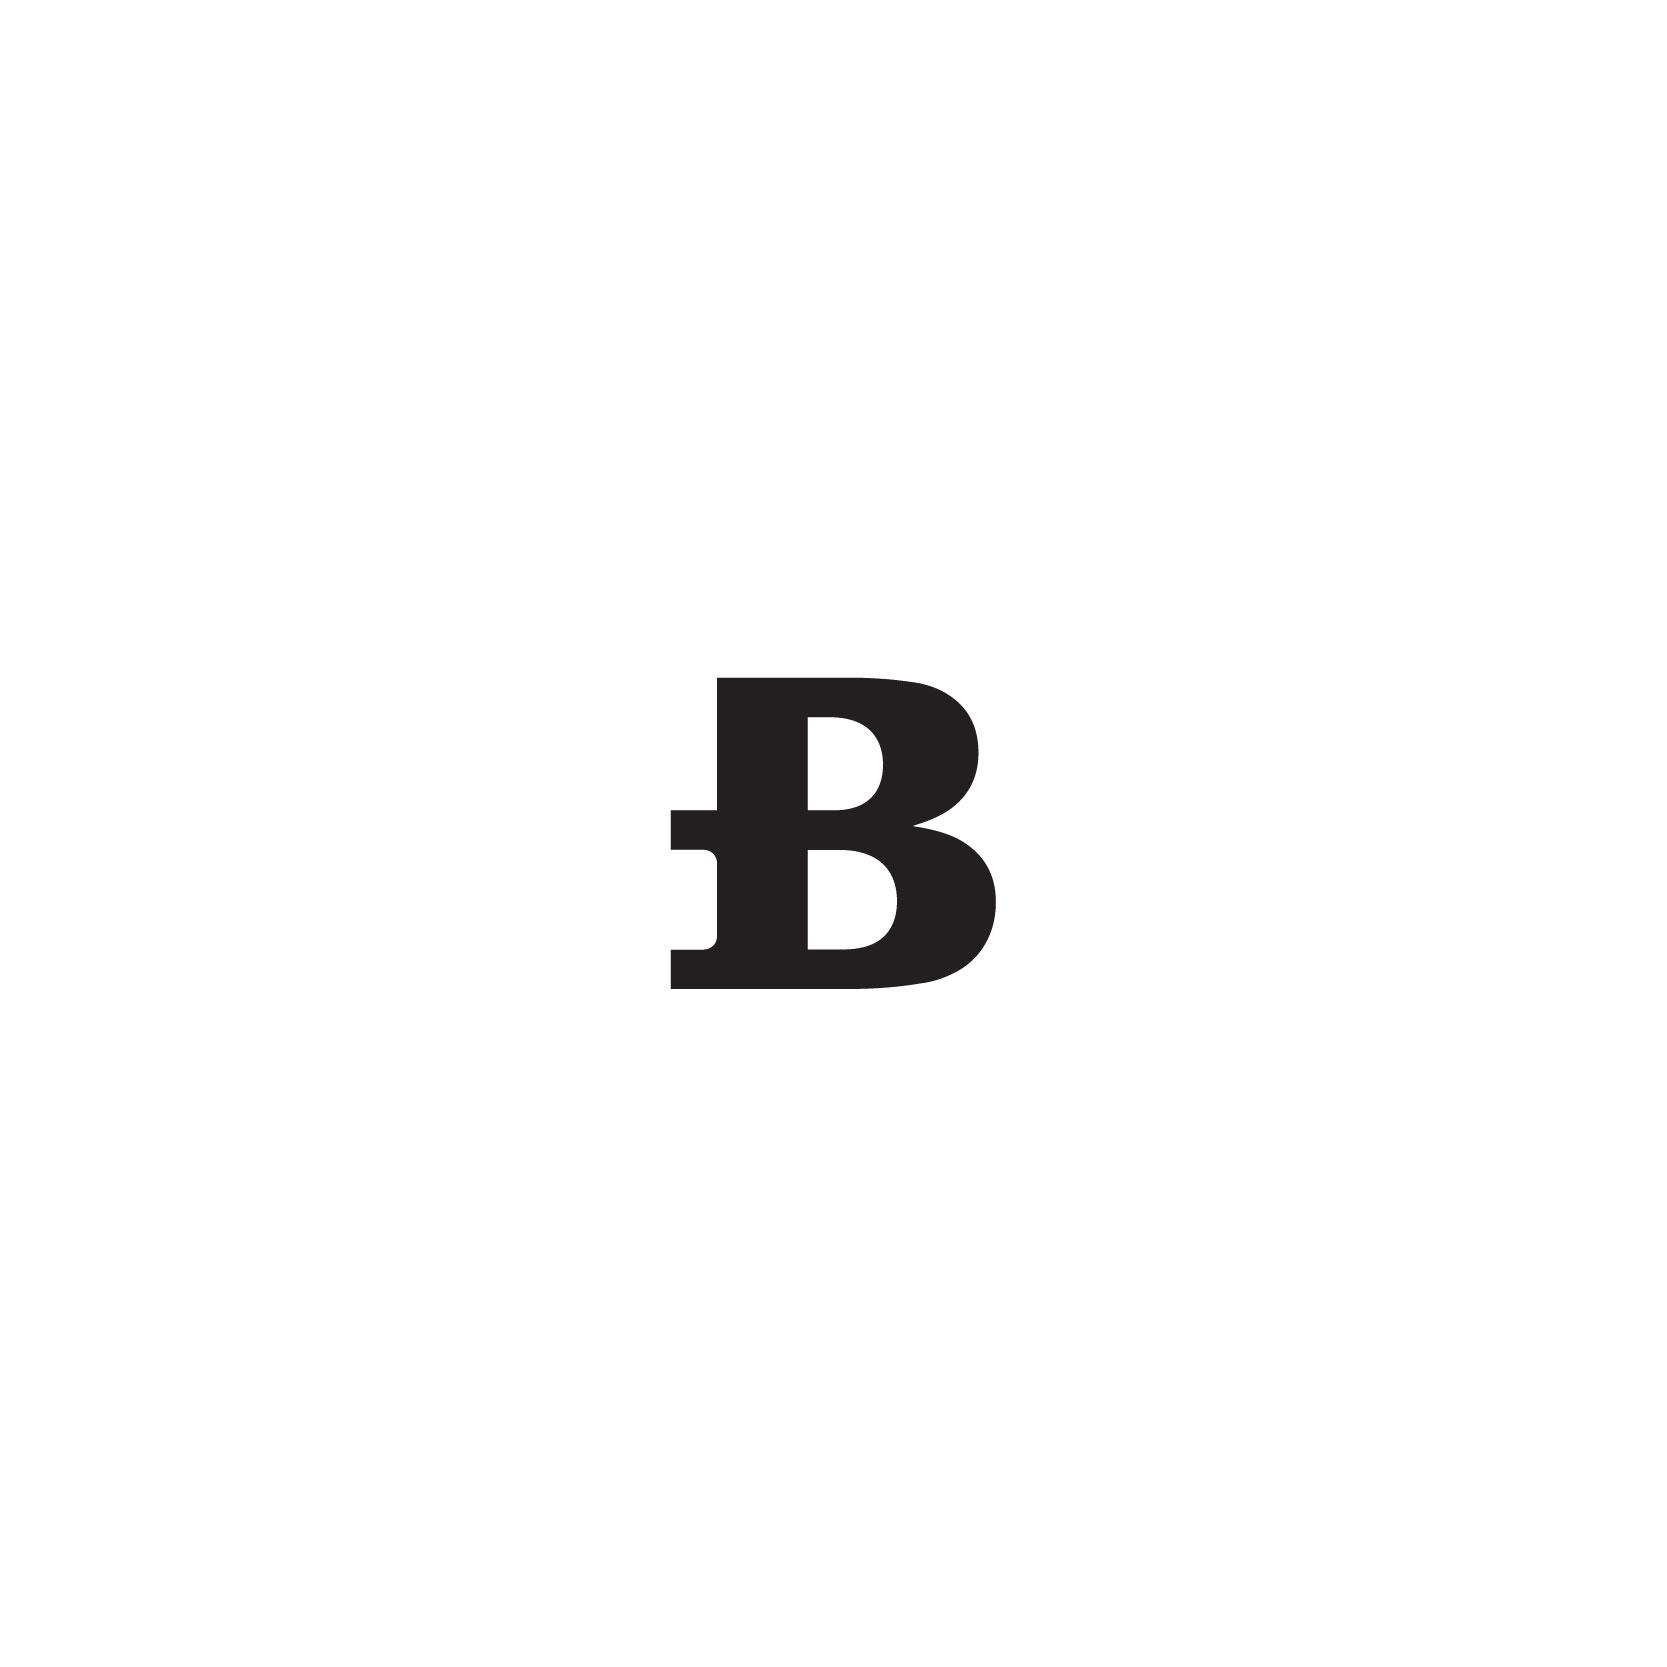 Logos 02-10.jpg